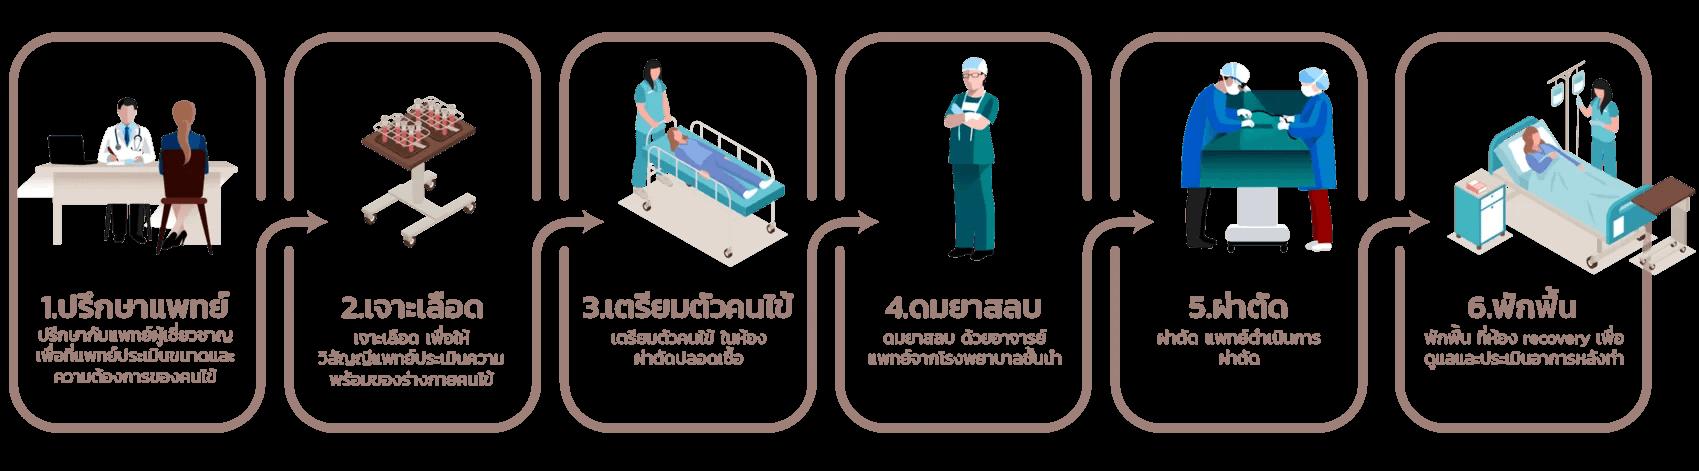 step-mentor-surgery